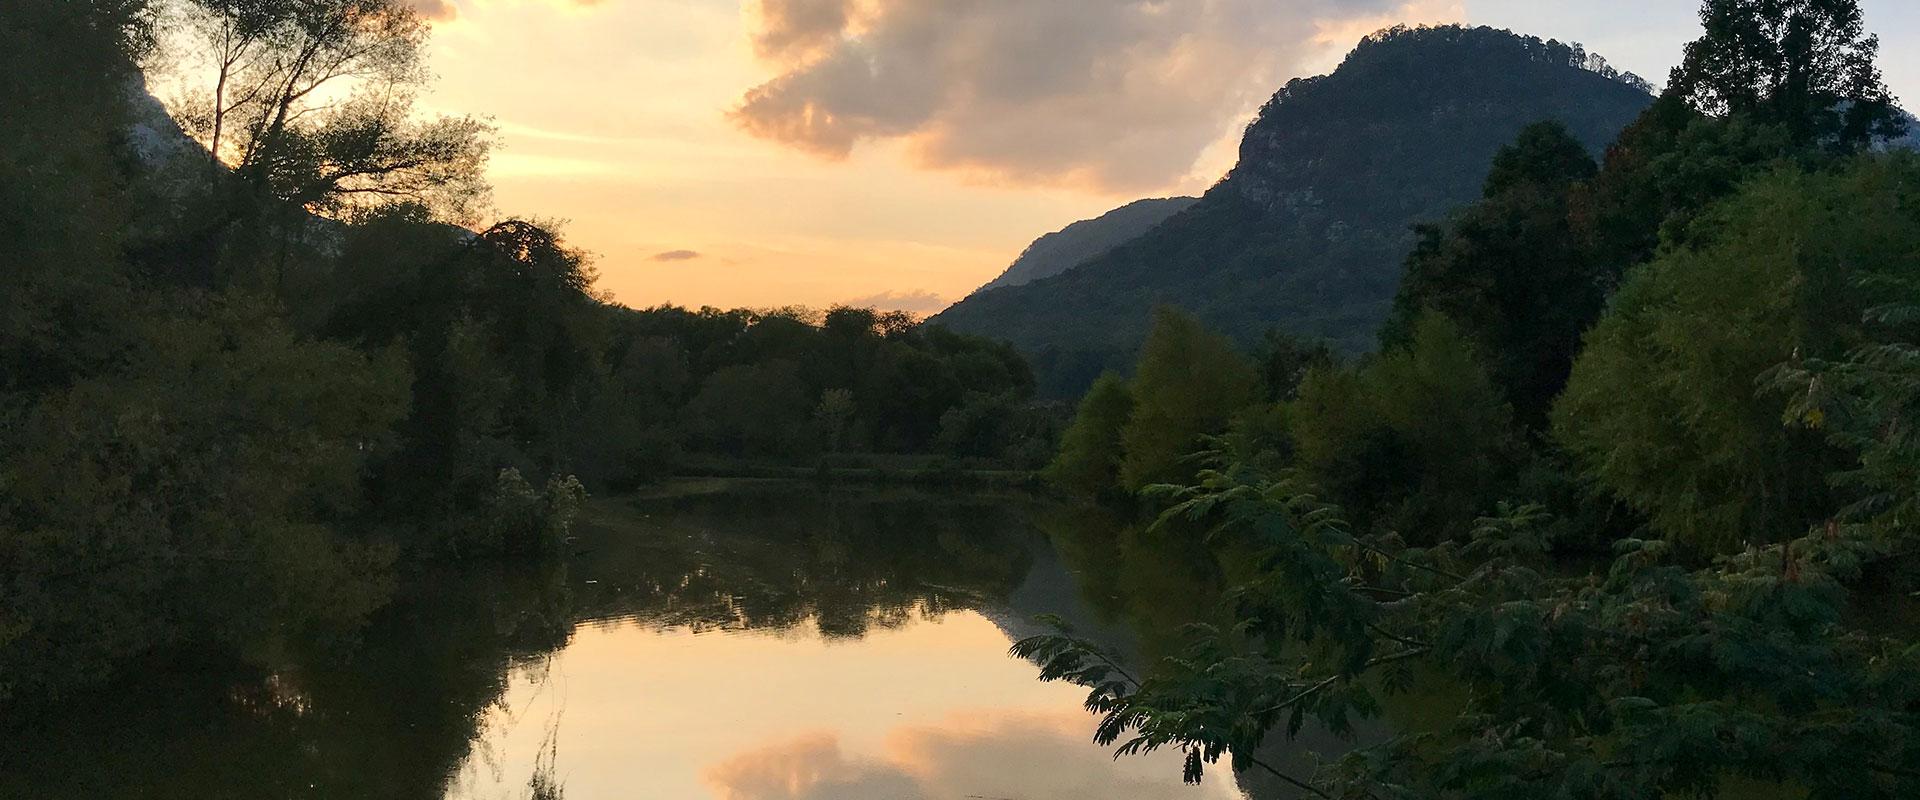 lake-lure-gallery